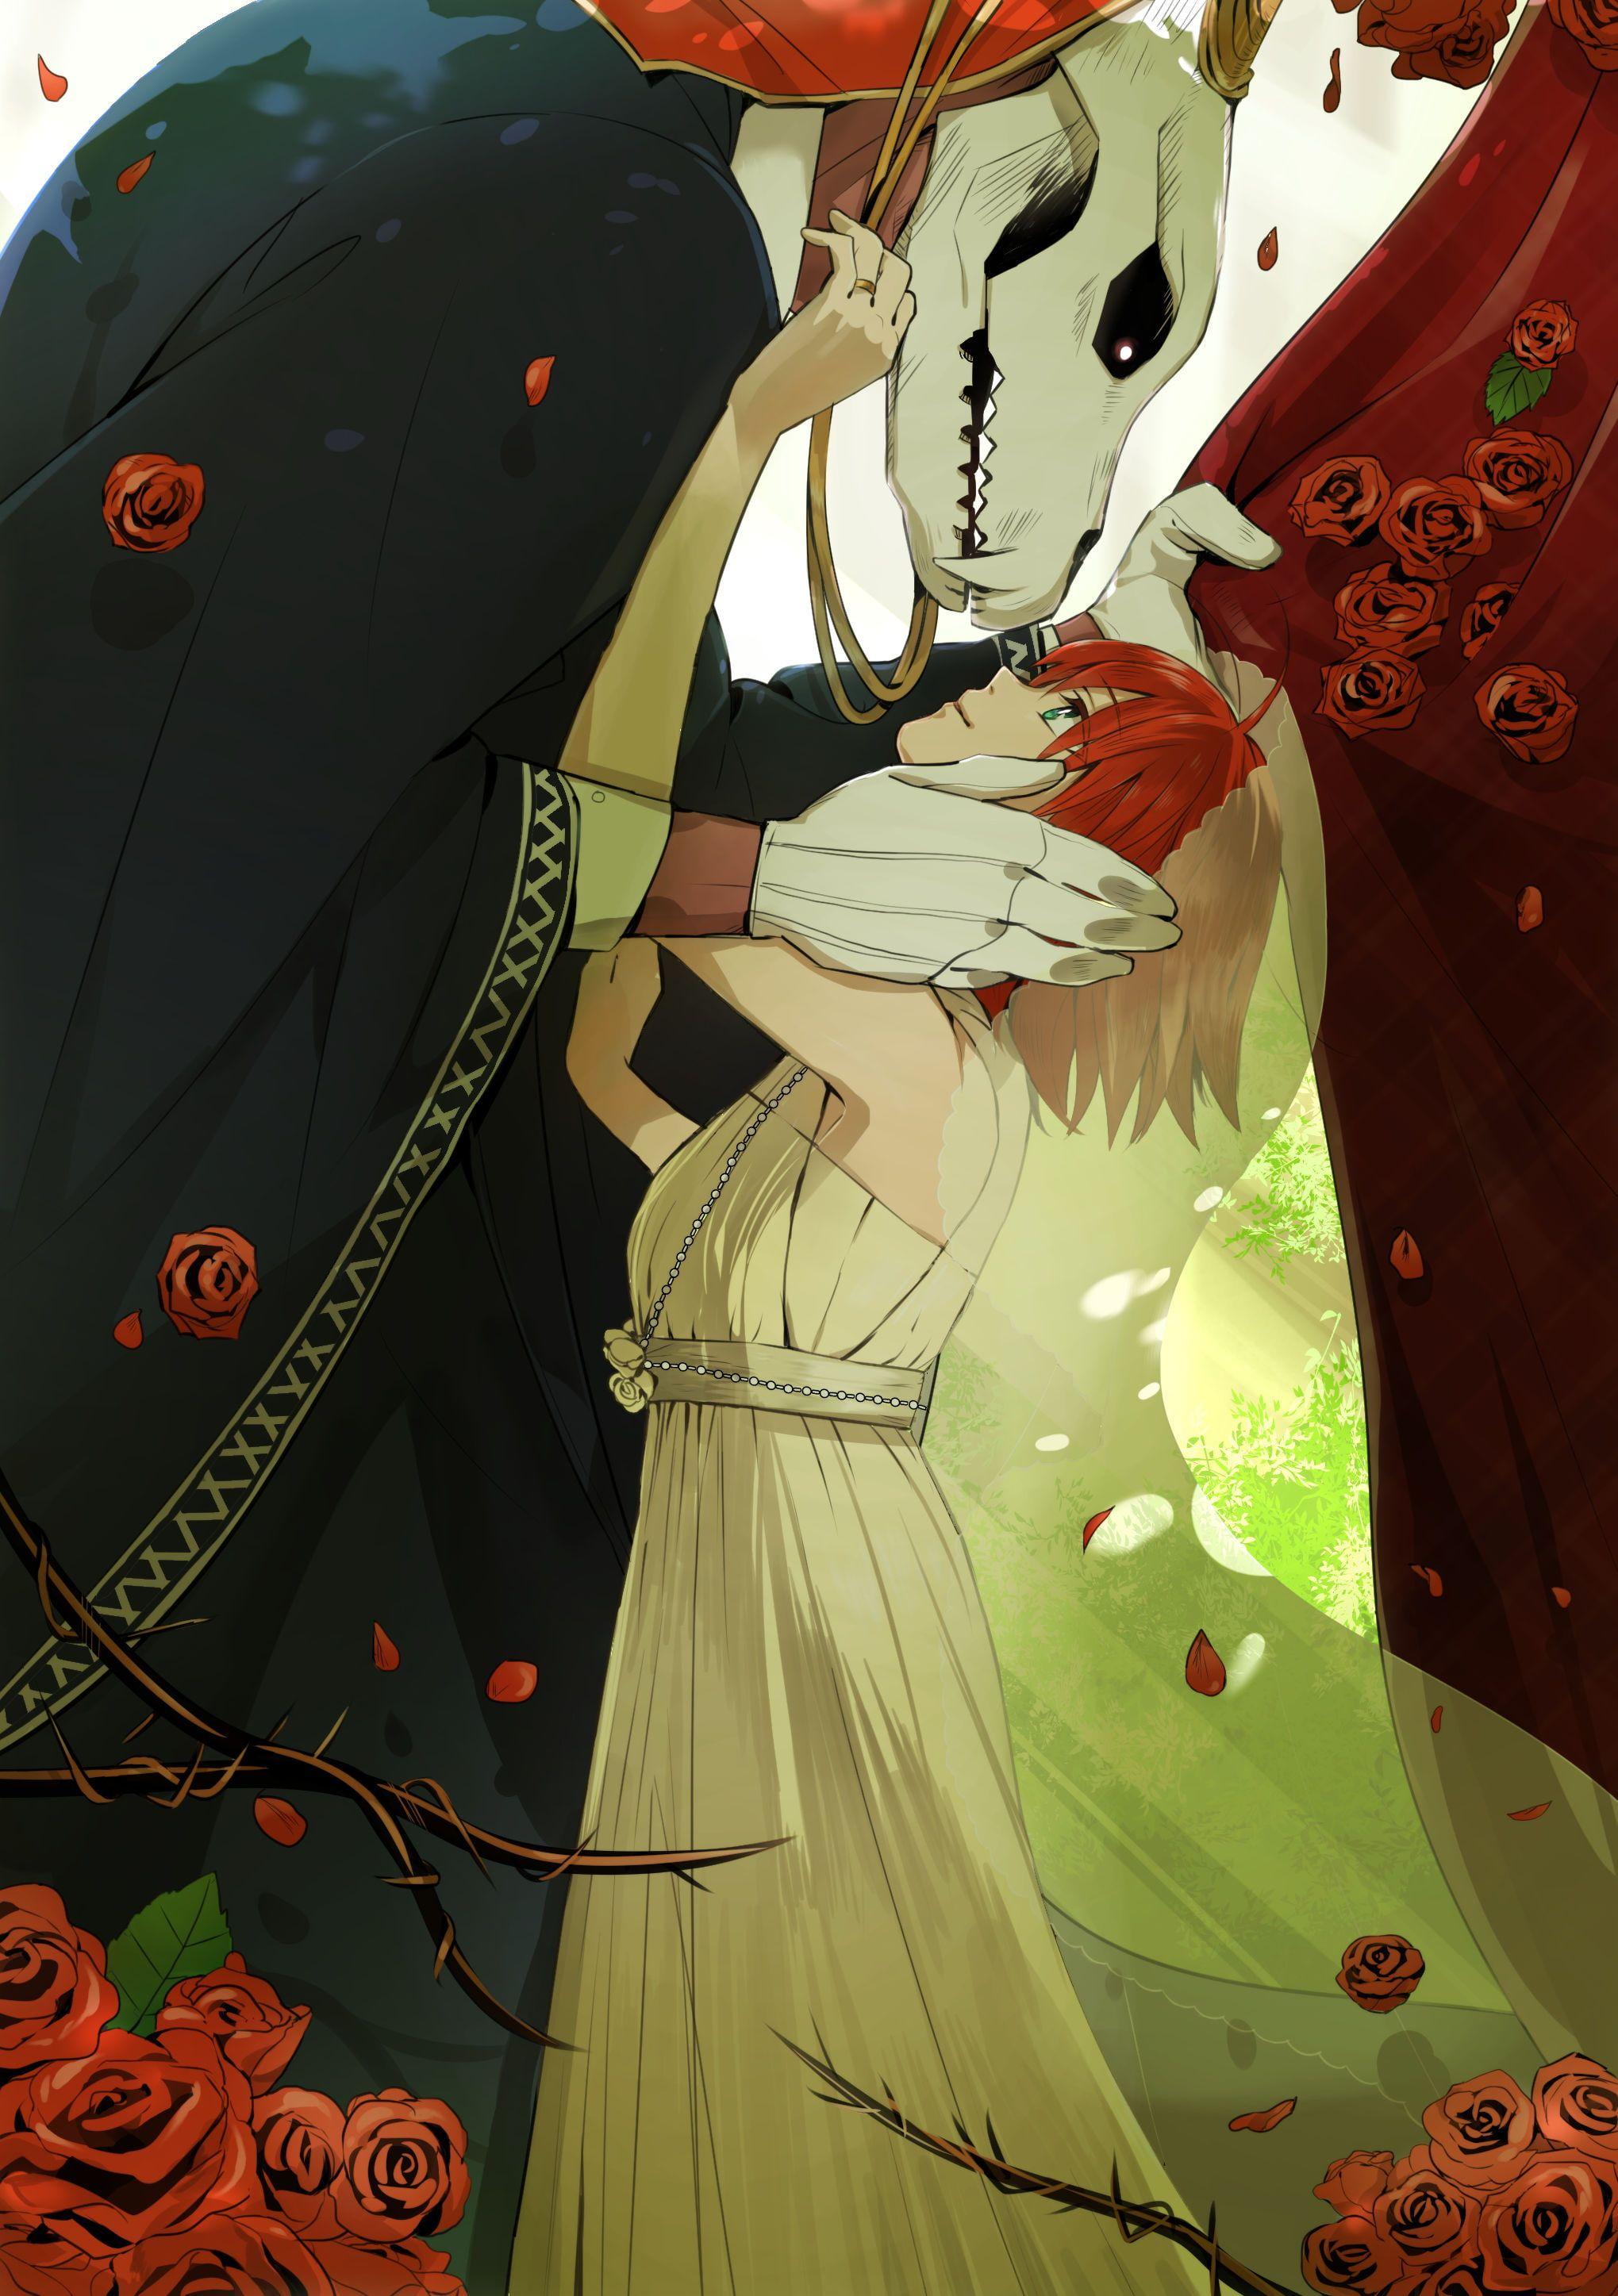 Mahoutsukai No Yome Anime Girls Hatori Chise Elias Ainsworth 2k